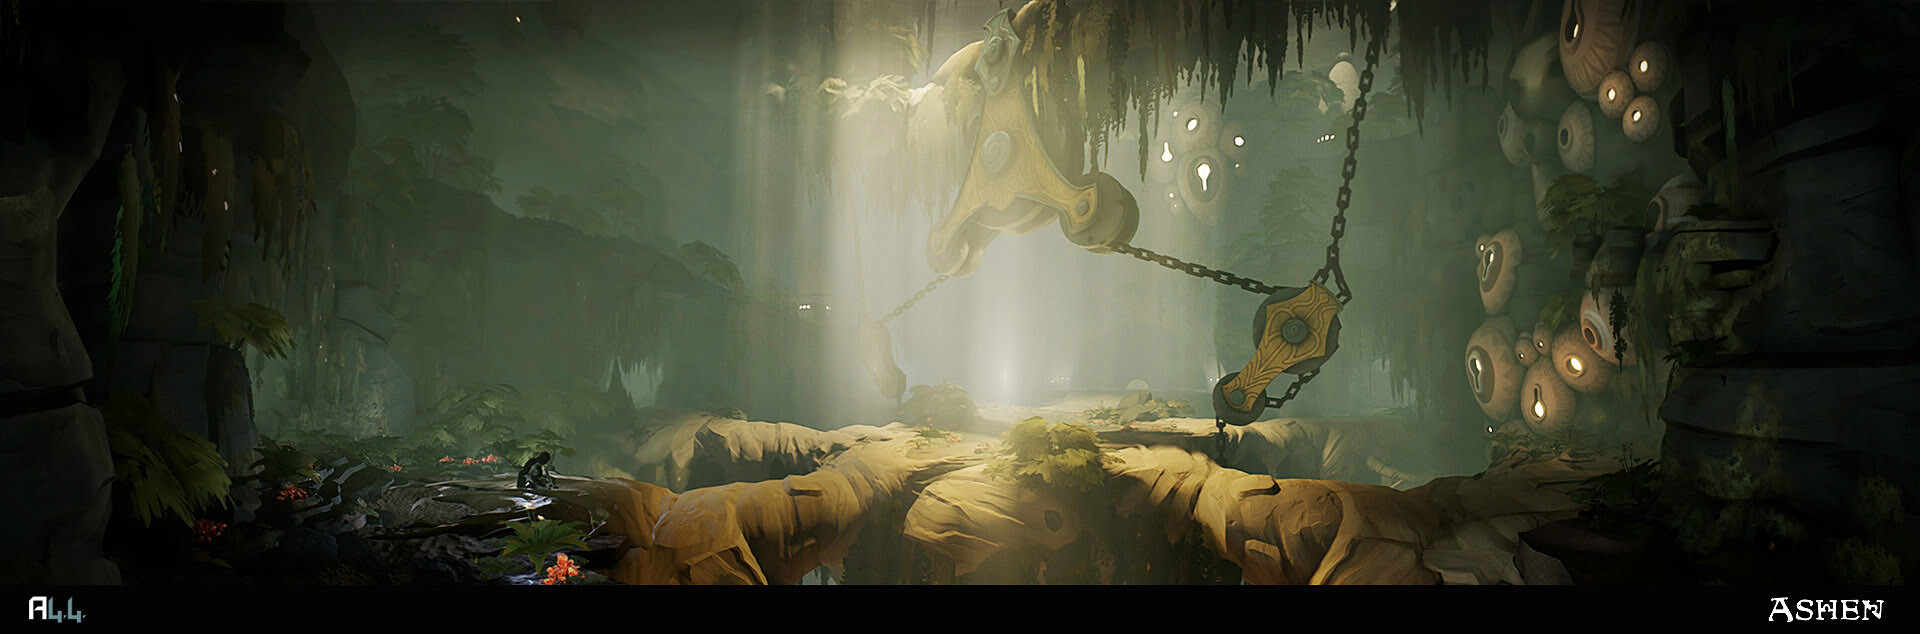 Pat dunal dlc caves 07